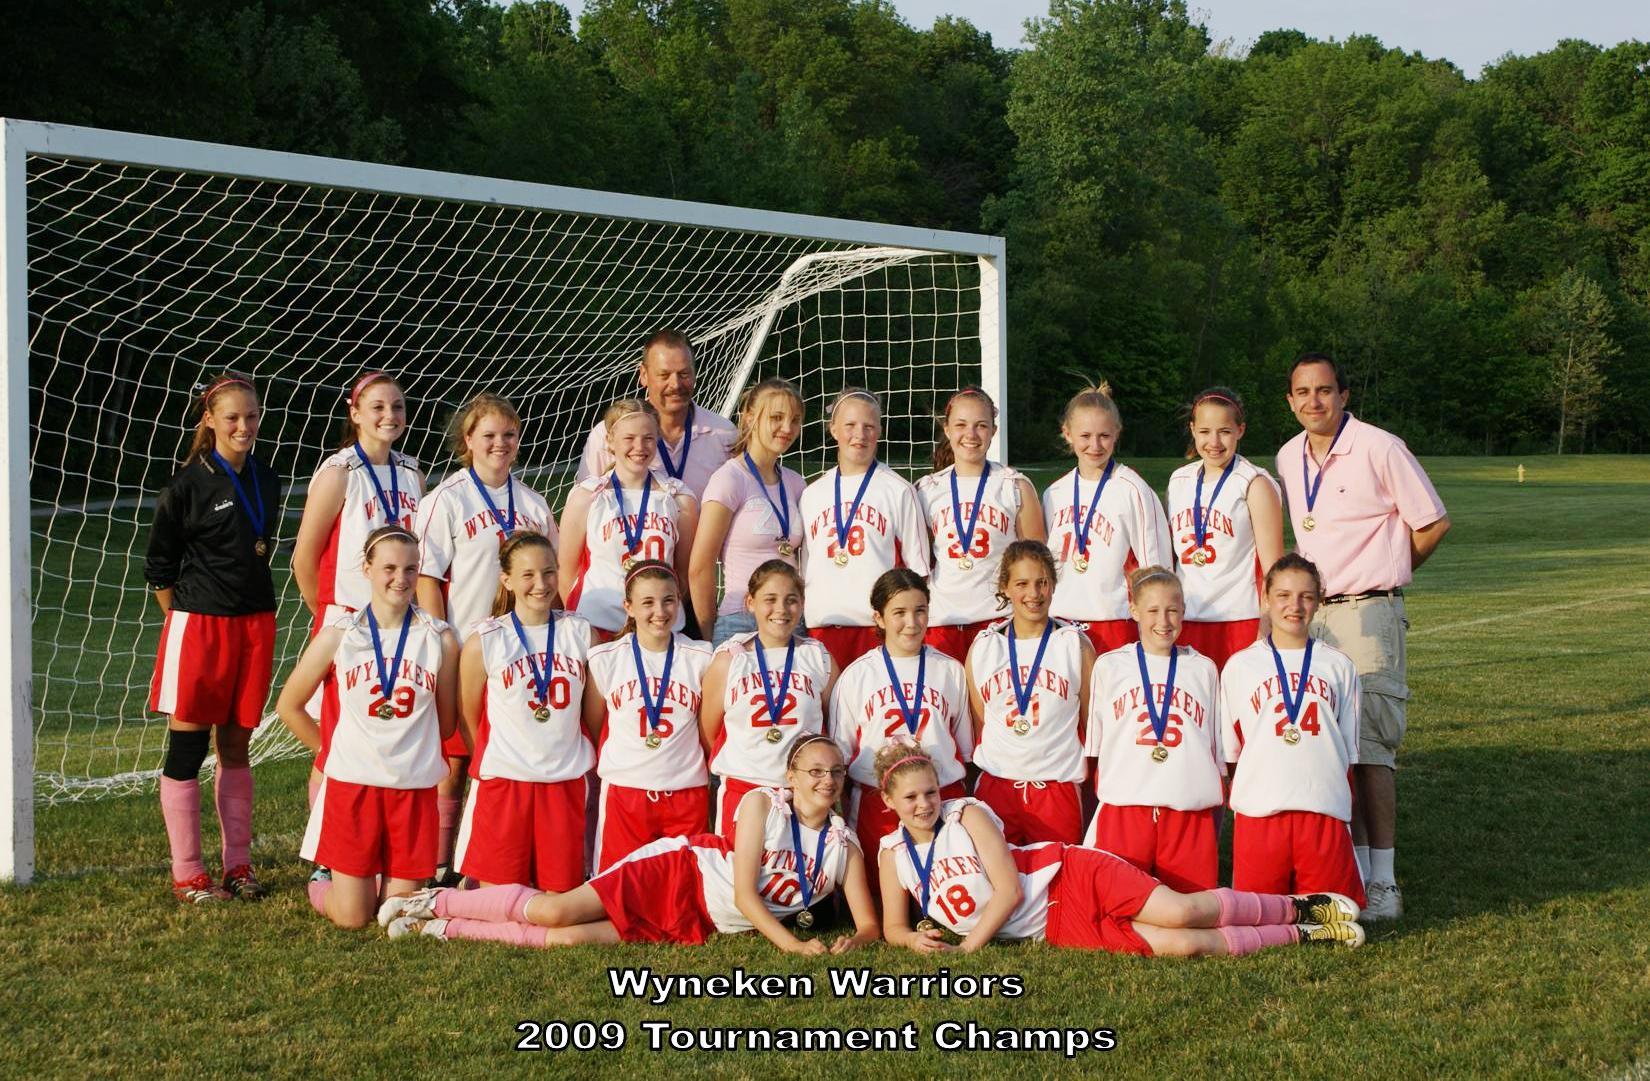 2009 Wyneken Warriors